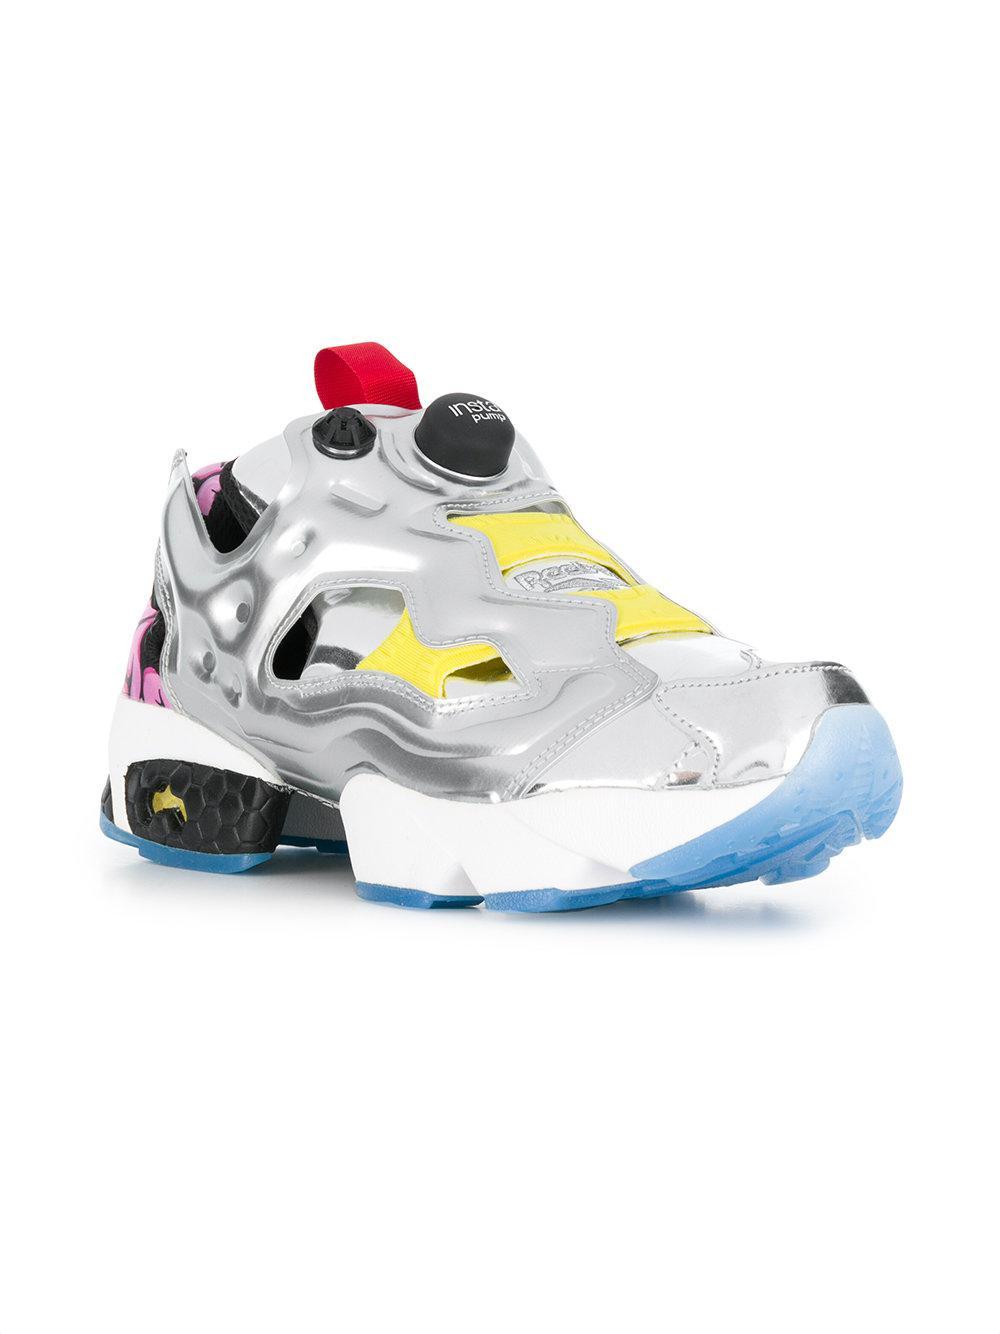 Lyst - Reebok Instapump Fury Og Vp Sneakers in Metallic a751b226e